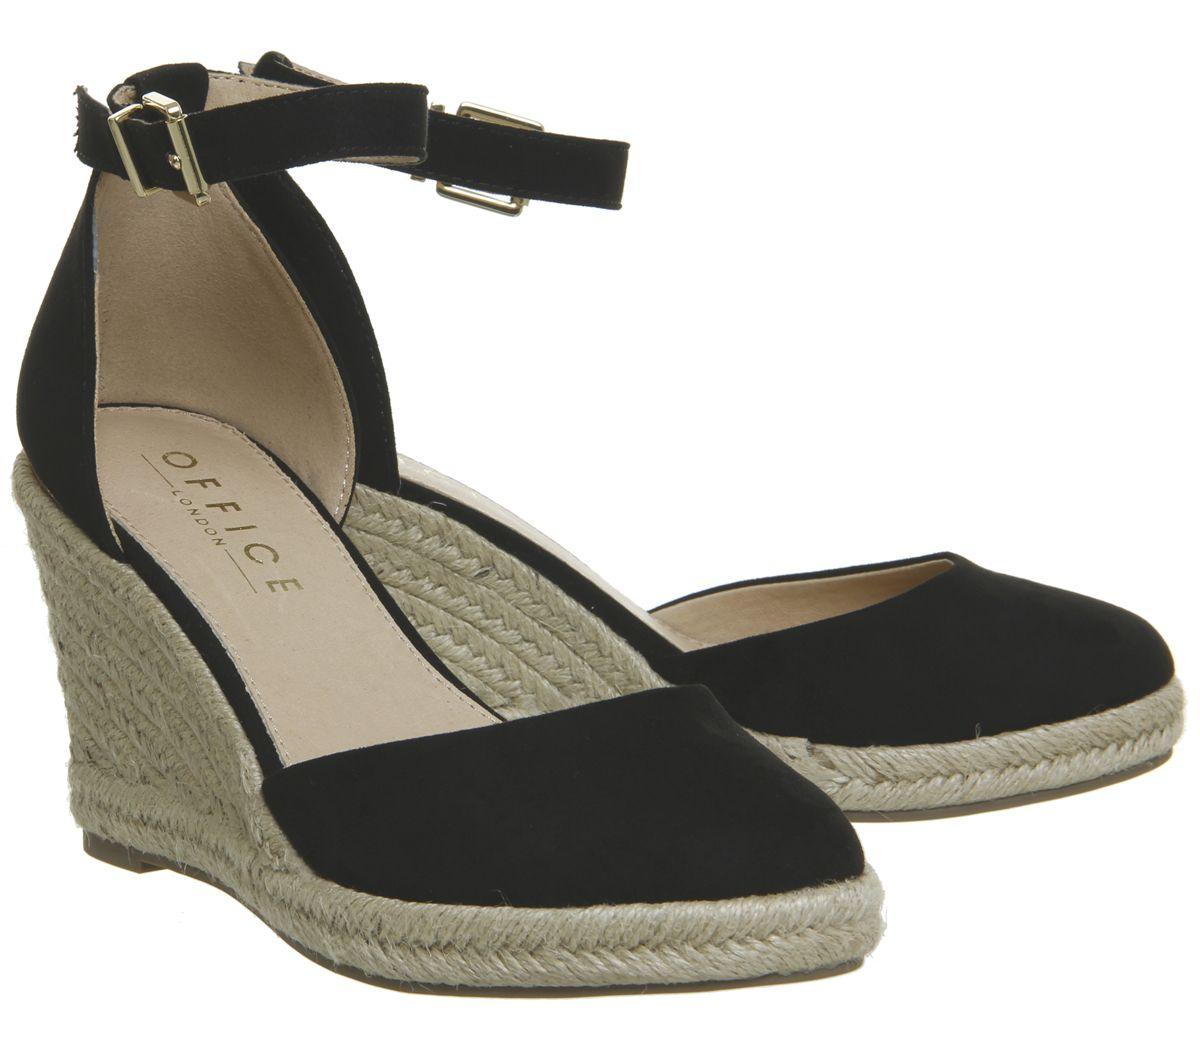 1f1dfe9c296 Sentinel Womens Office Marsha Closed Toe Espadrille Wedges Black With Gold  Heel Clip Heel